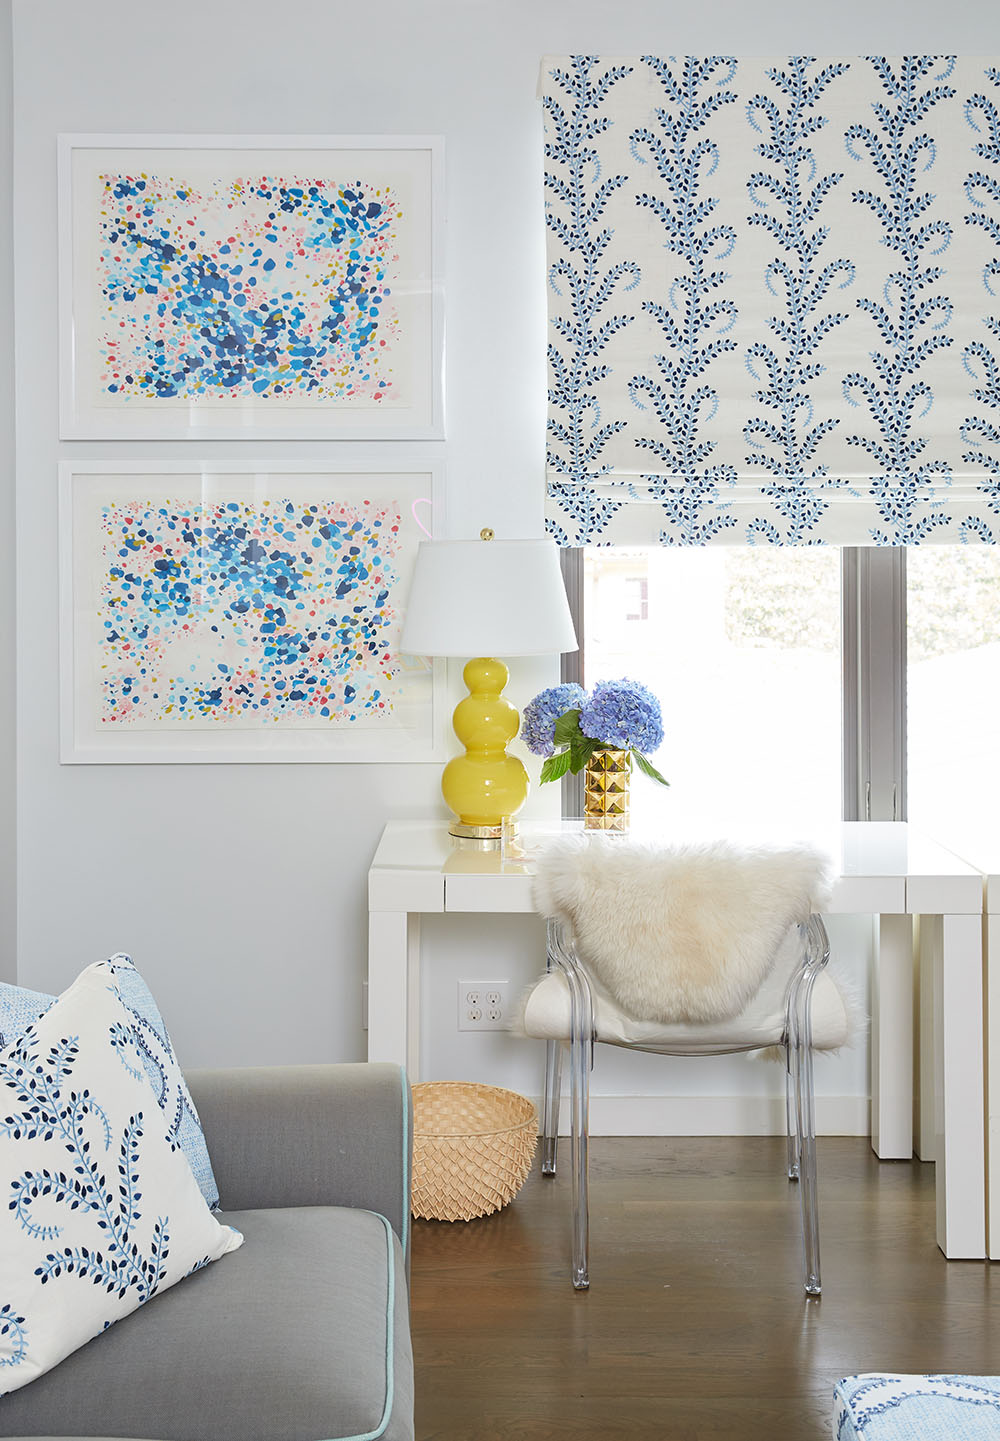 Mimosa-Lane-Blog-One-Room-Challenge.jpg, katie-Craig